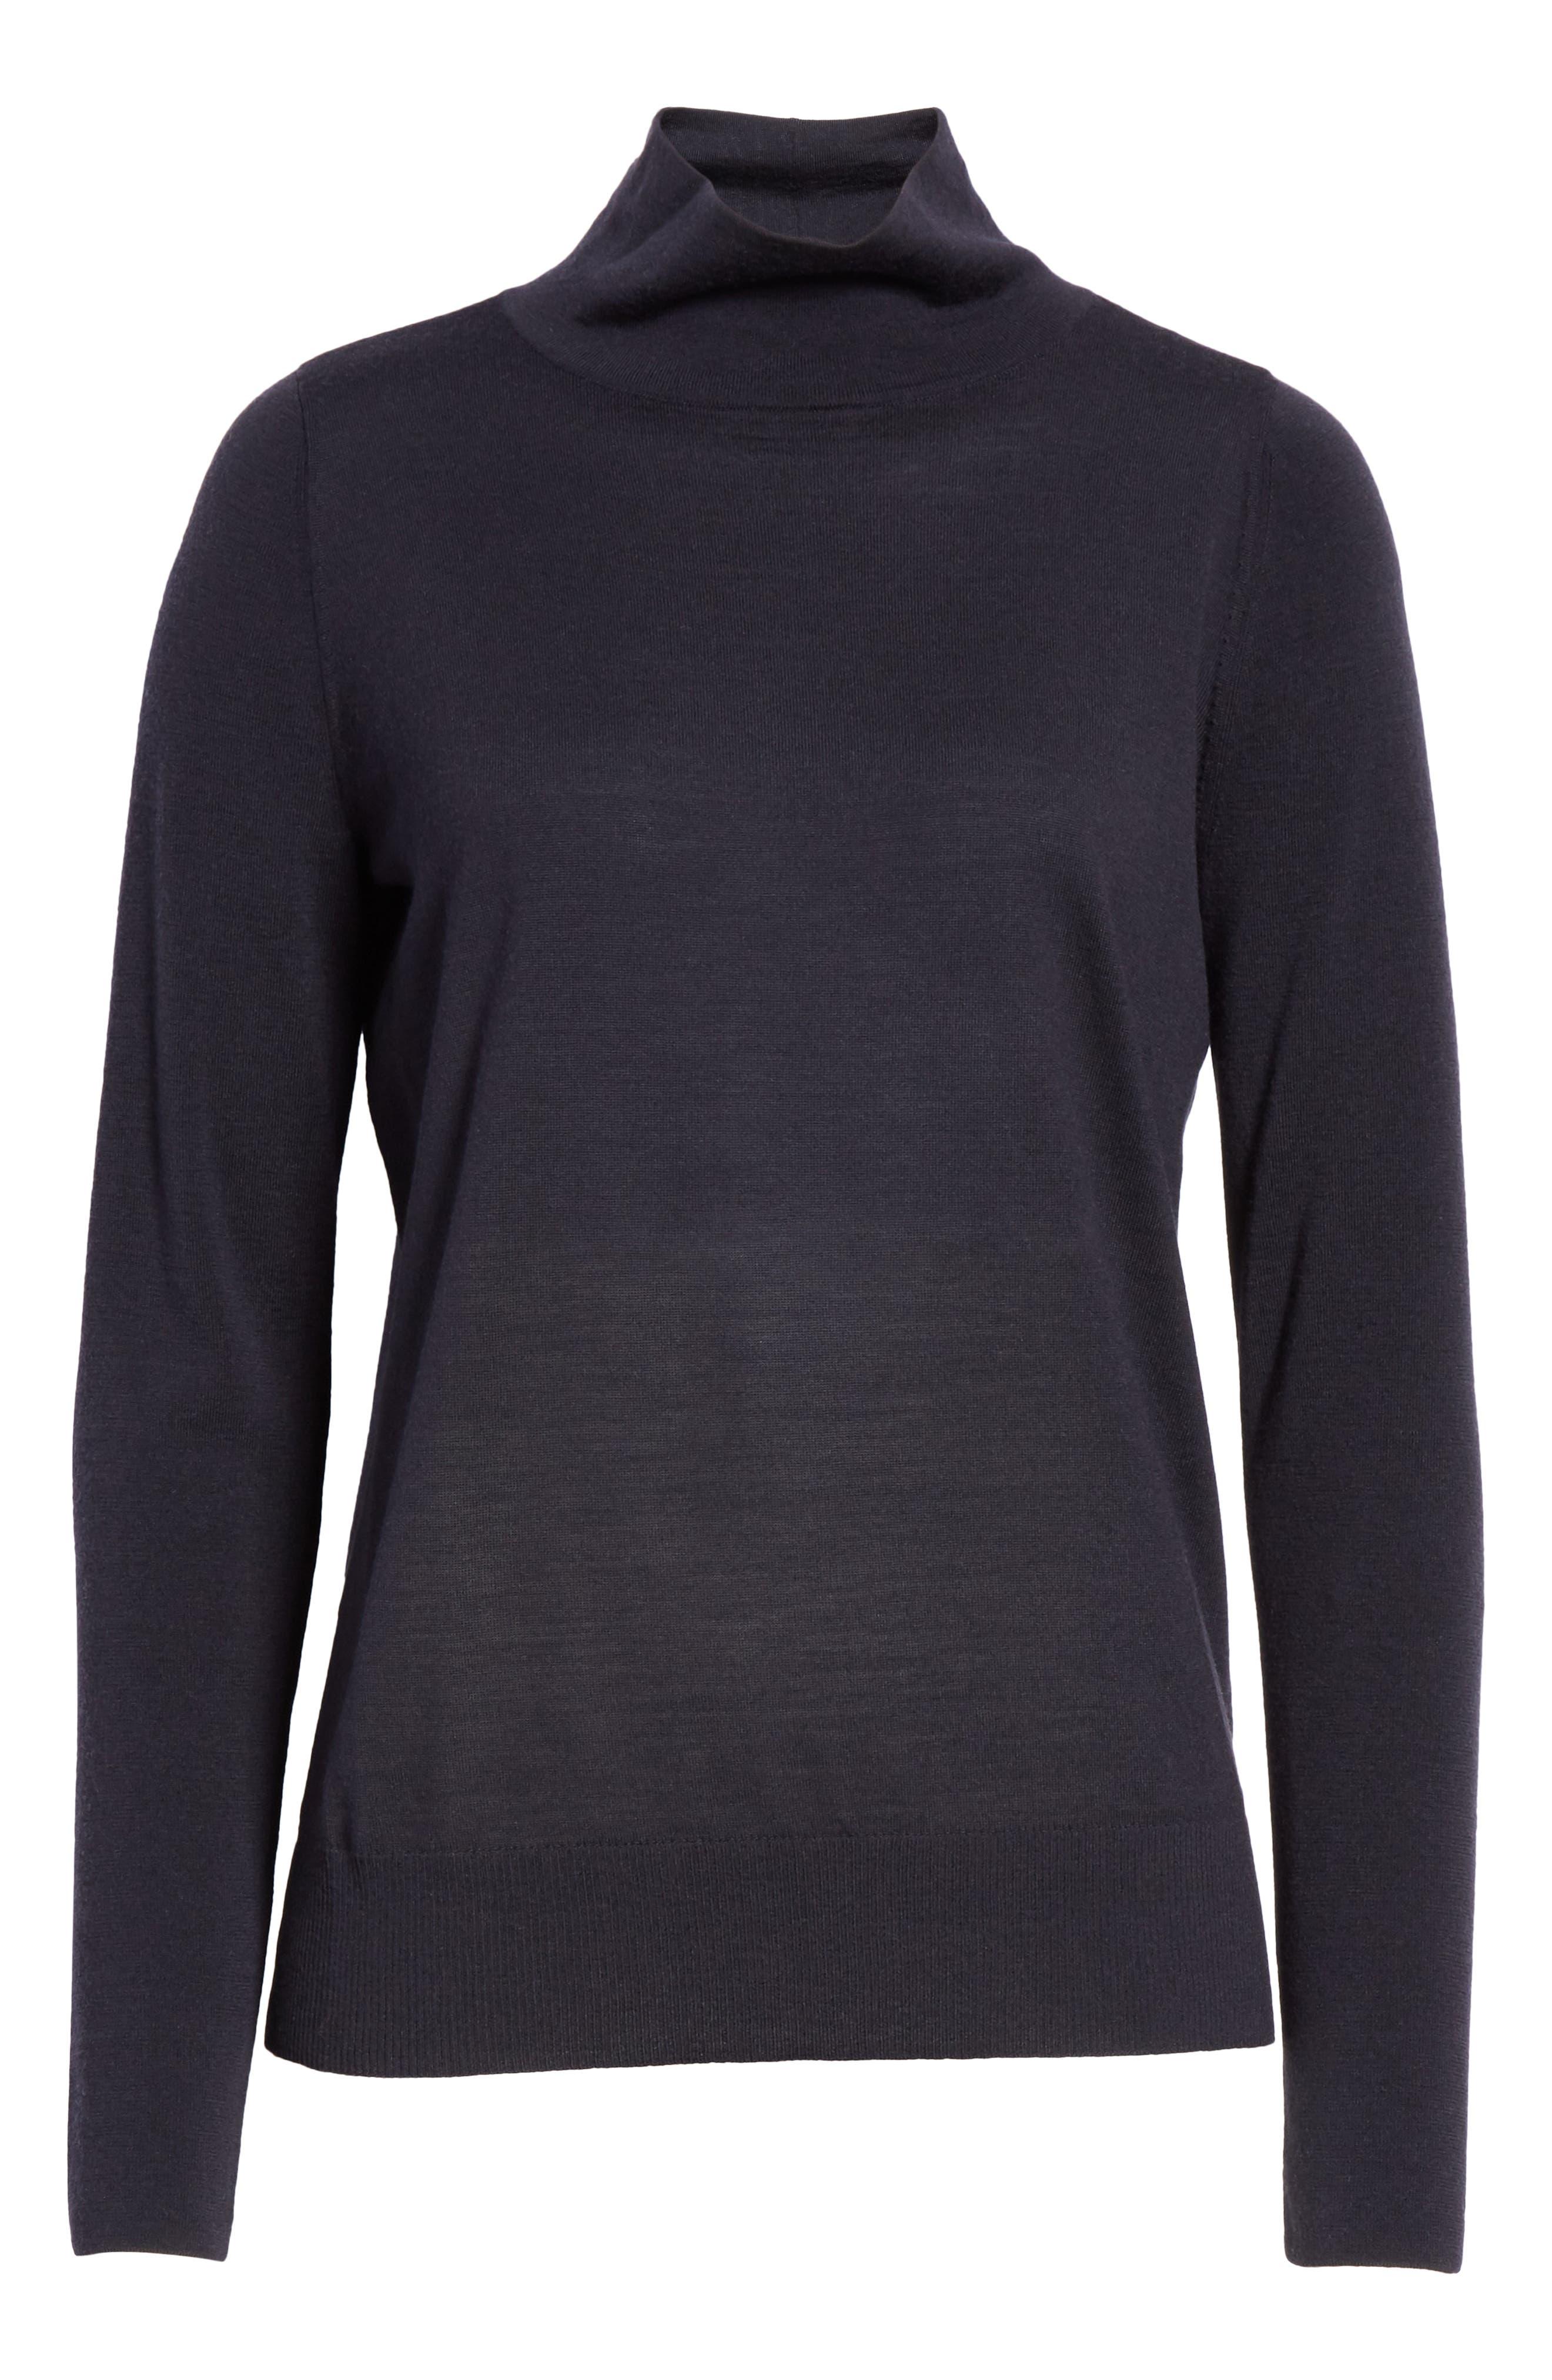 Merino Wool Modern Turtleneck Sweater,                             Alternate thumbnail 6, color,                             479